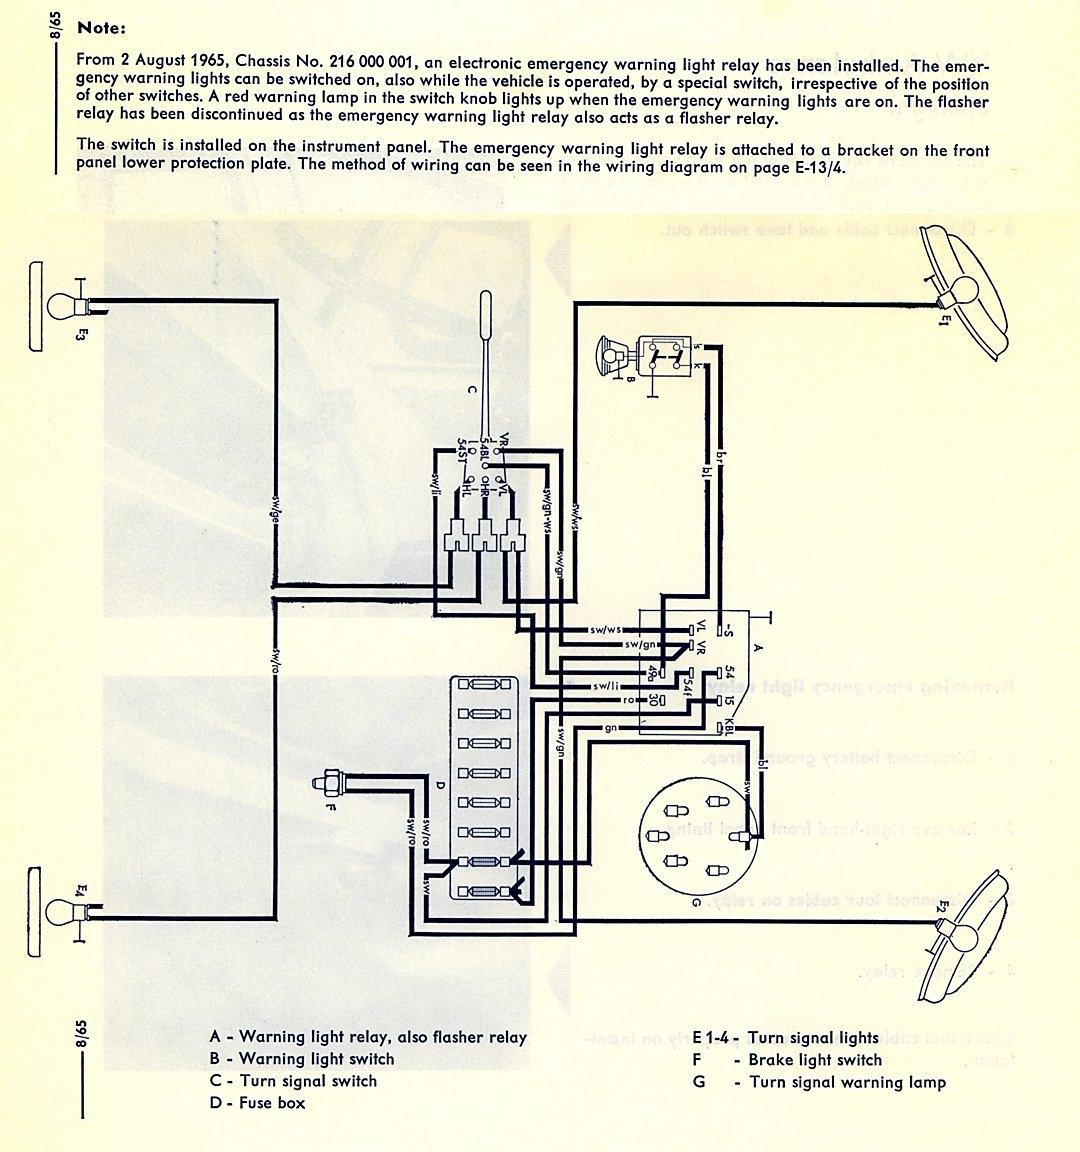 hight resolution of lithonia emergency light wiring diagram emergency lighting wiring diagram beautiful thesamba type 2 wiring diagrams